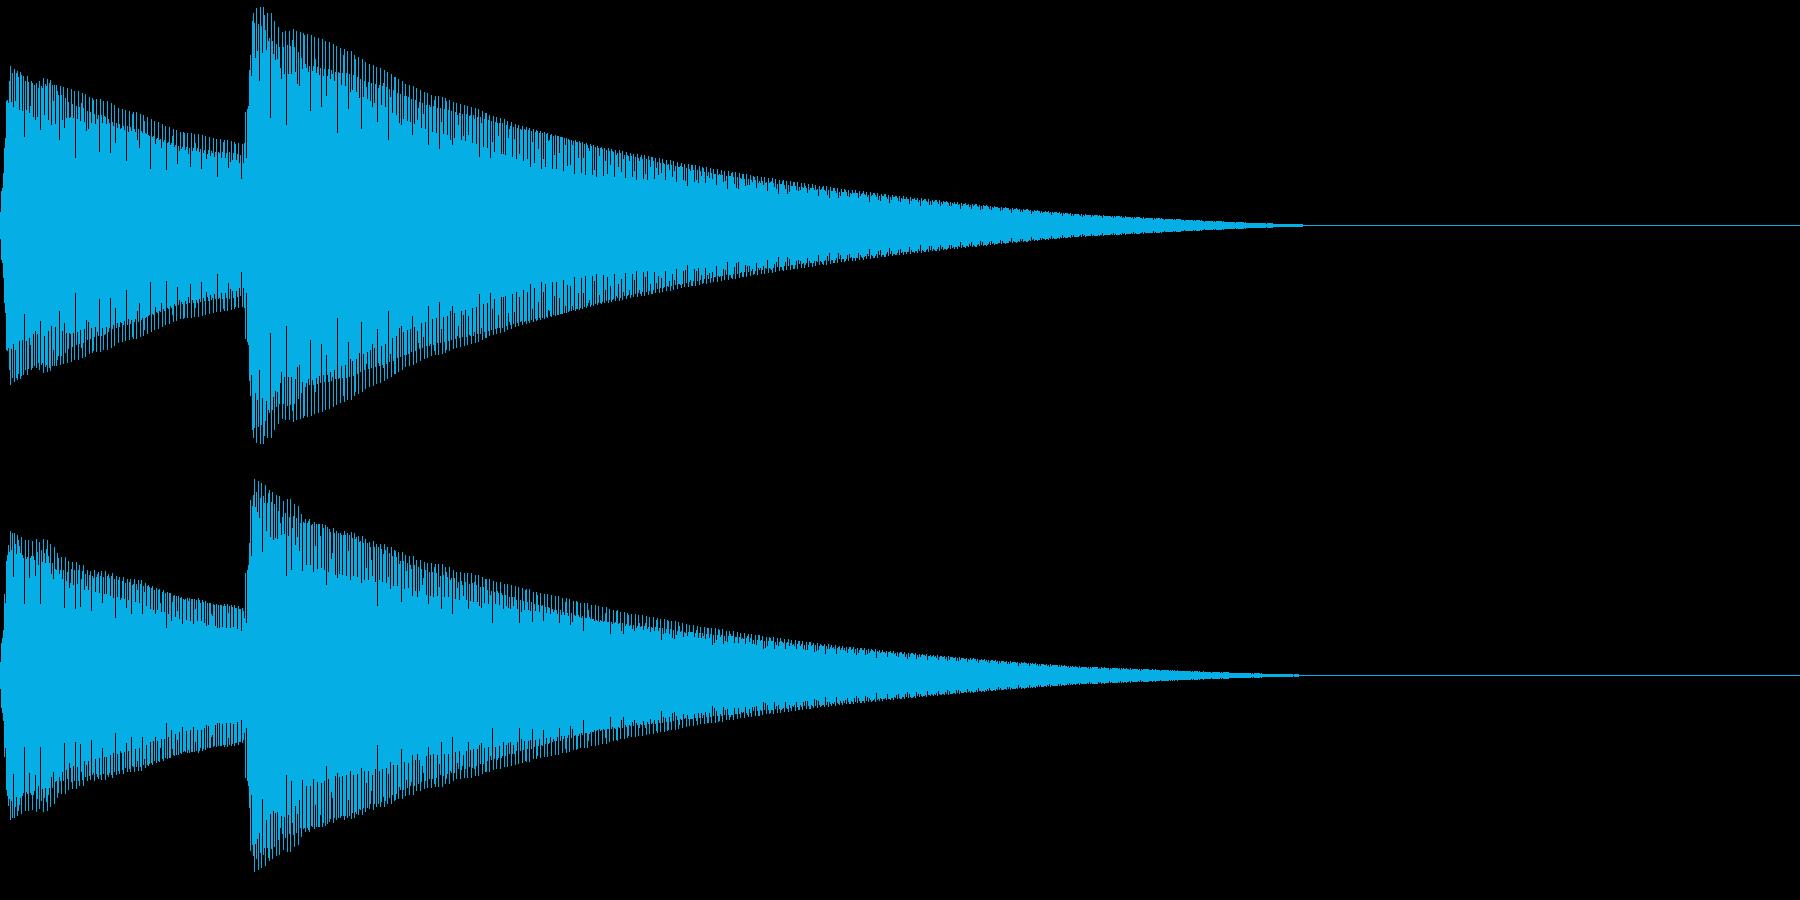 Parody スマホ音声アシスト 起動音の再生済みの波形